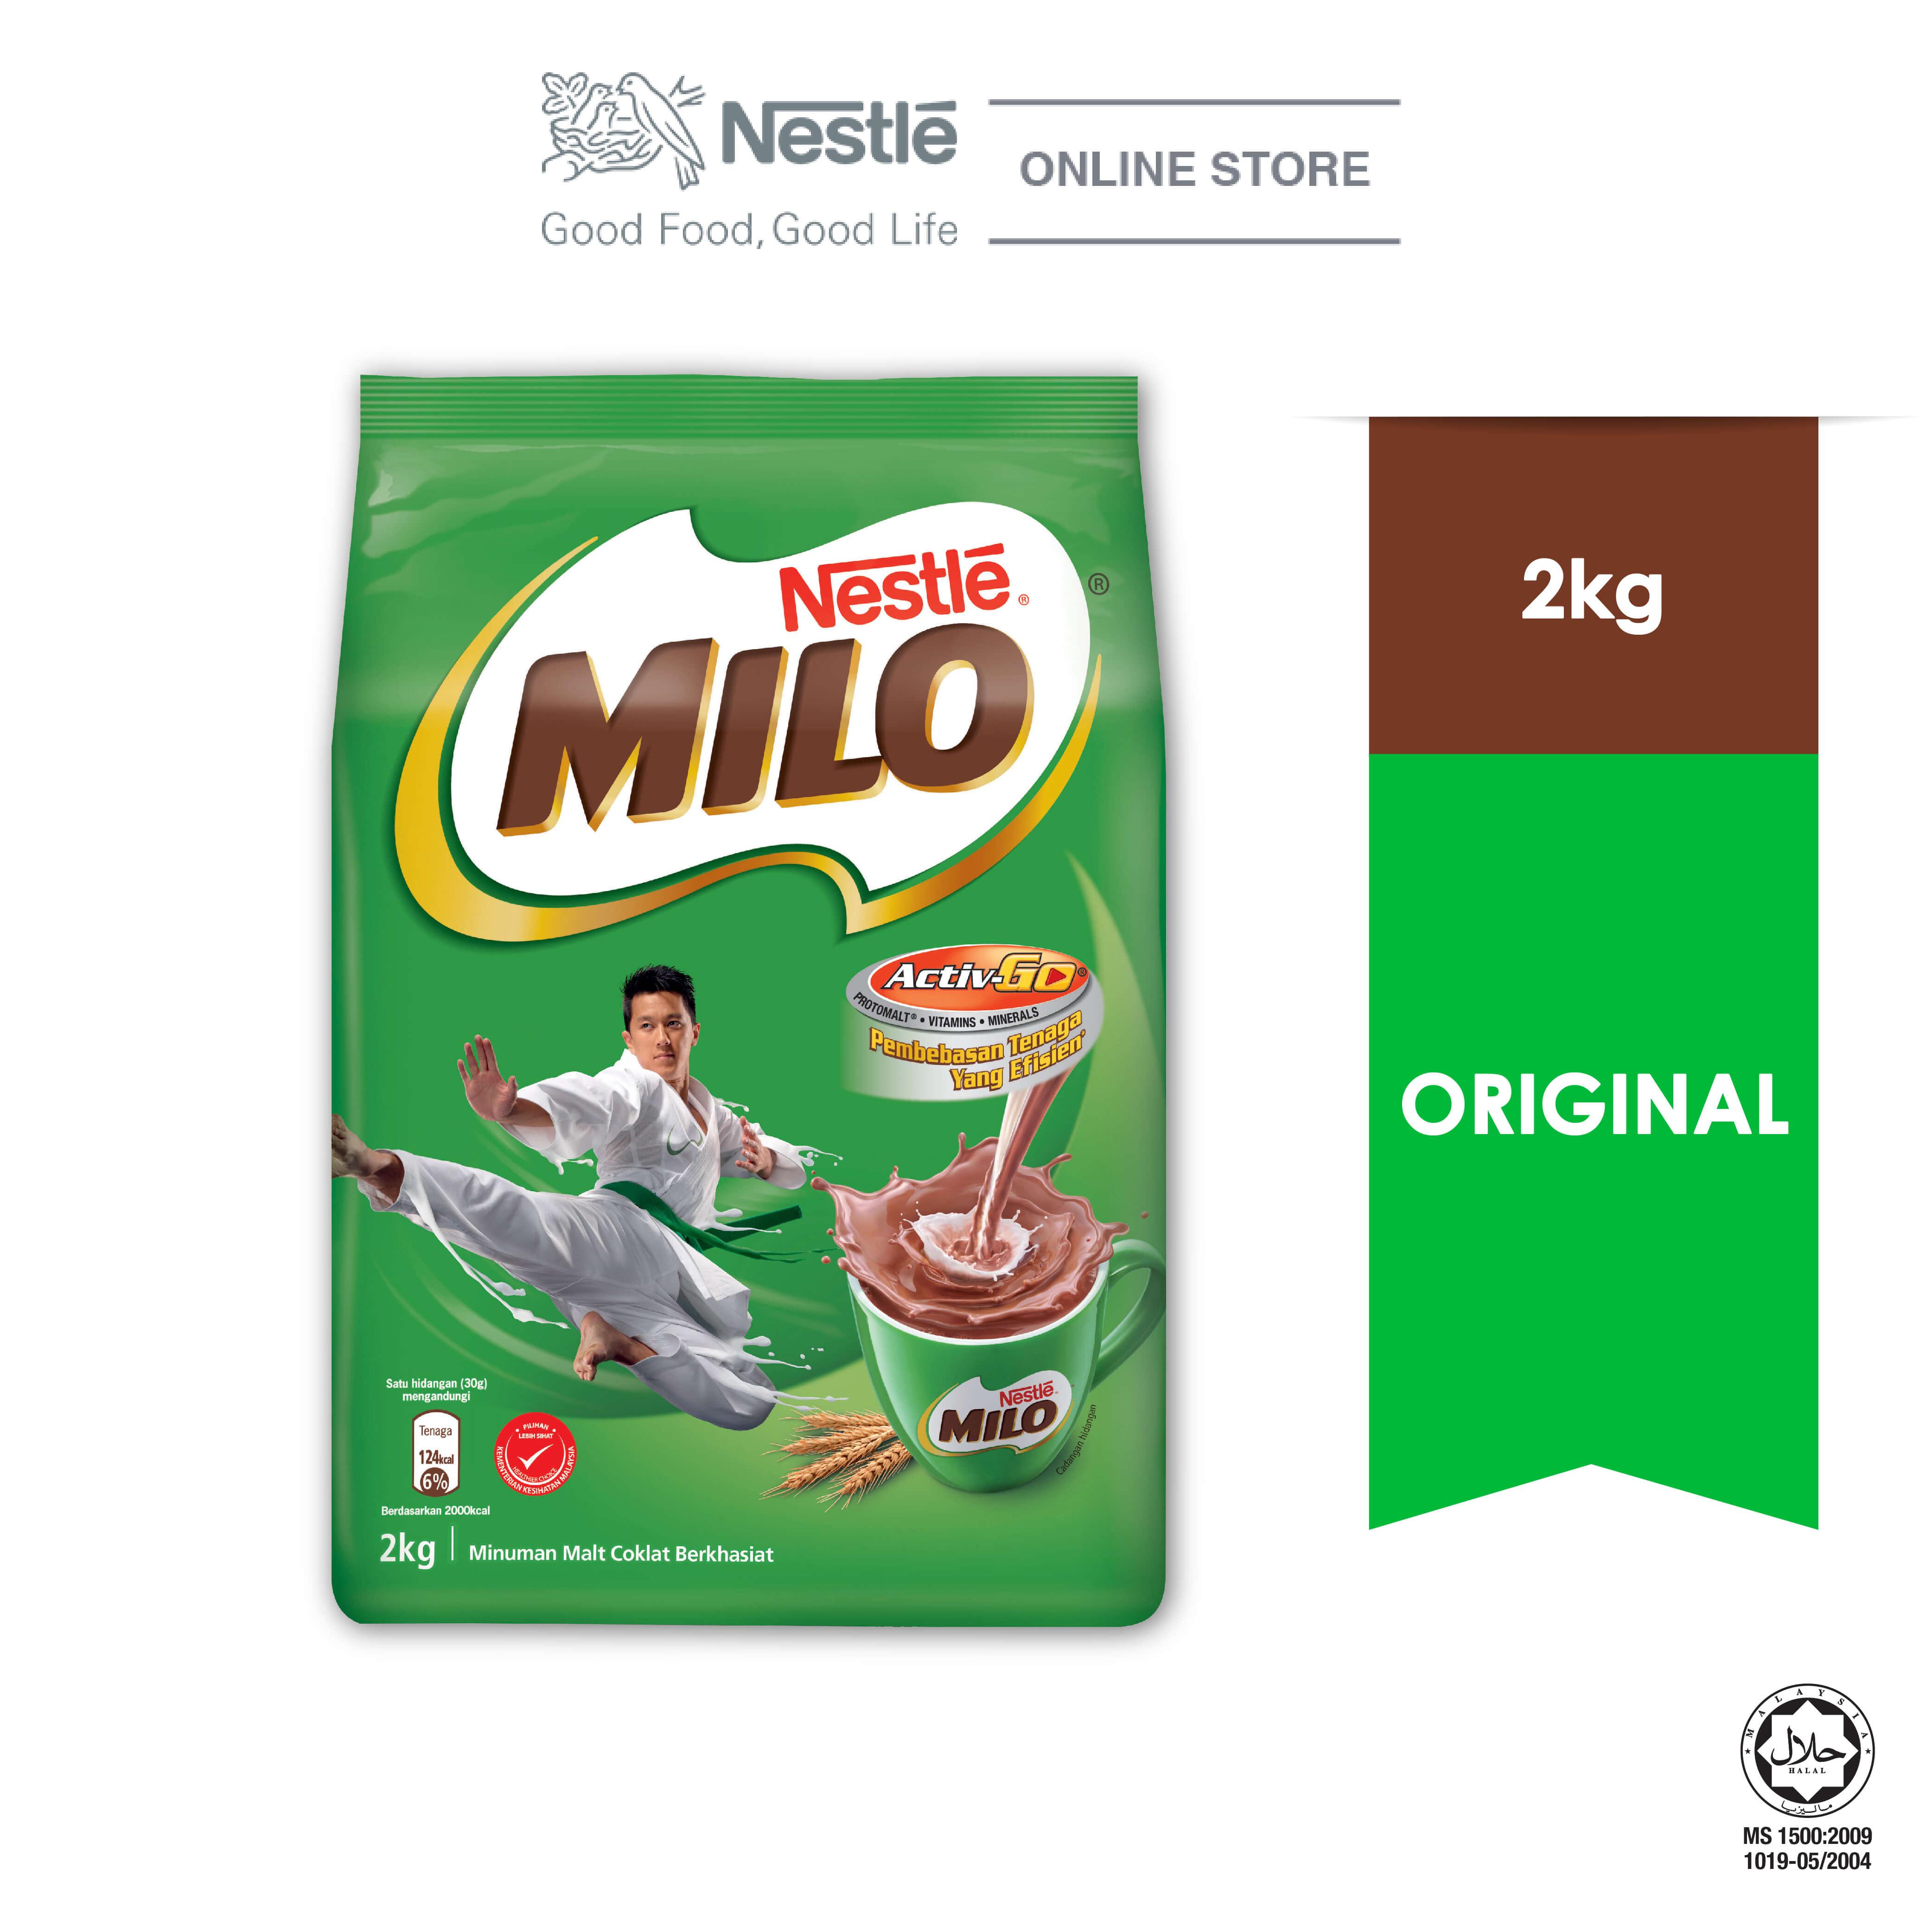 NESTLE MILO ACTIV-GO CHOCOLATE MALT POWDER Soft Pack 2kg Exp.Date : Oct20